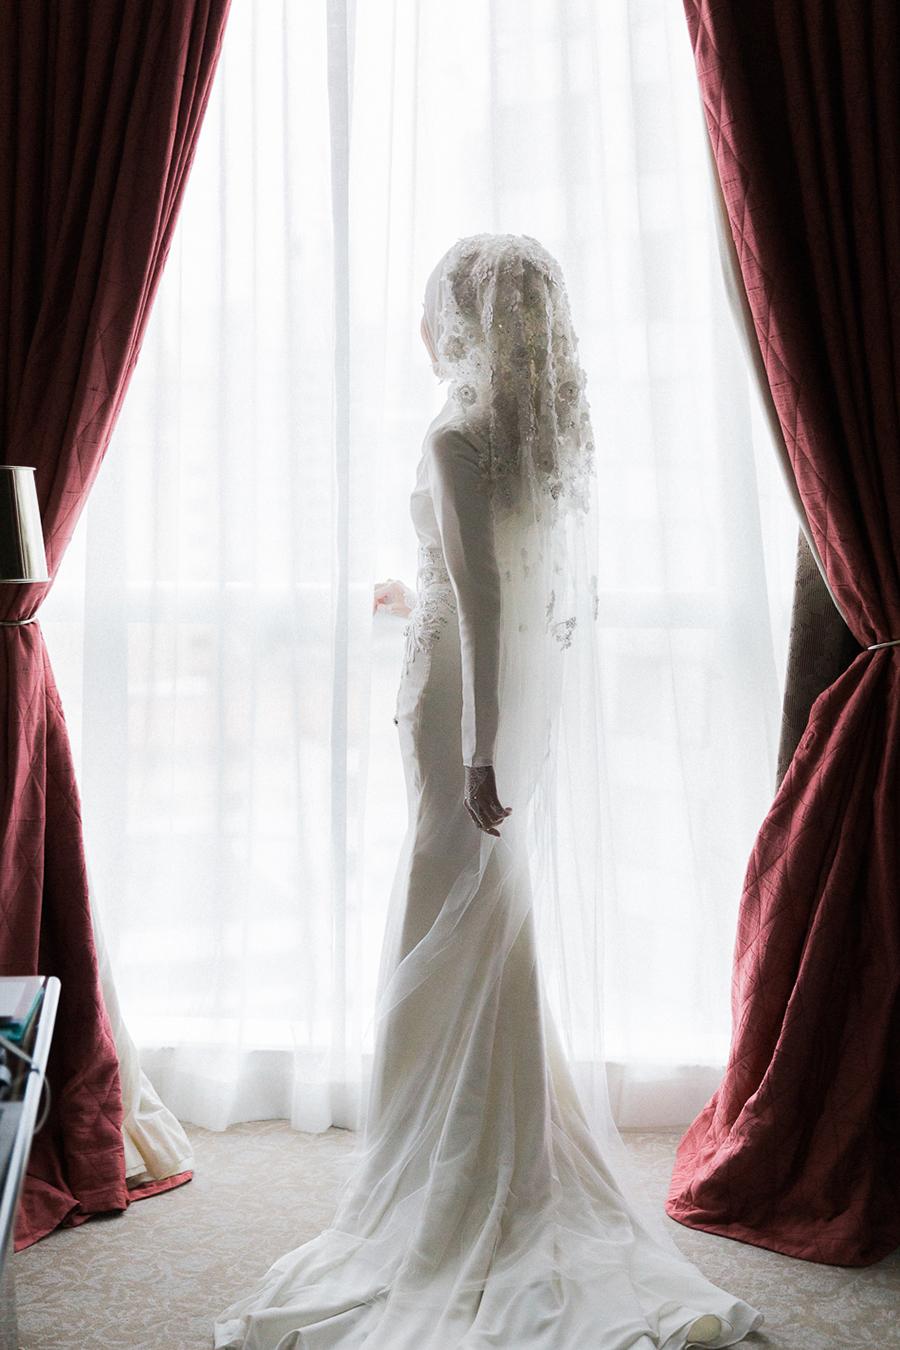 Chen_Sands_Photo_Destination_Wedding_Photographer_StRegis_Singapore-21.jpg